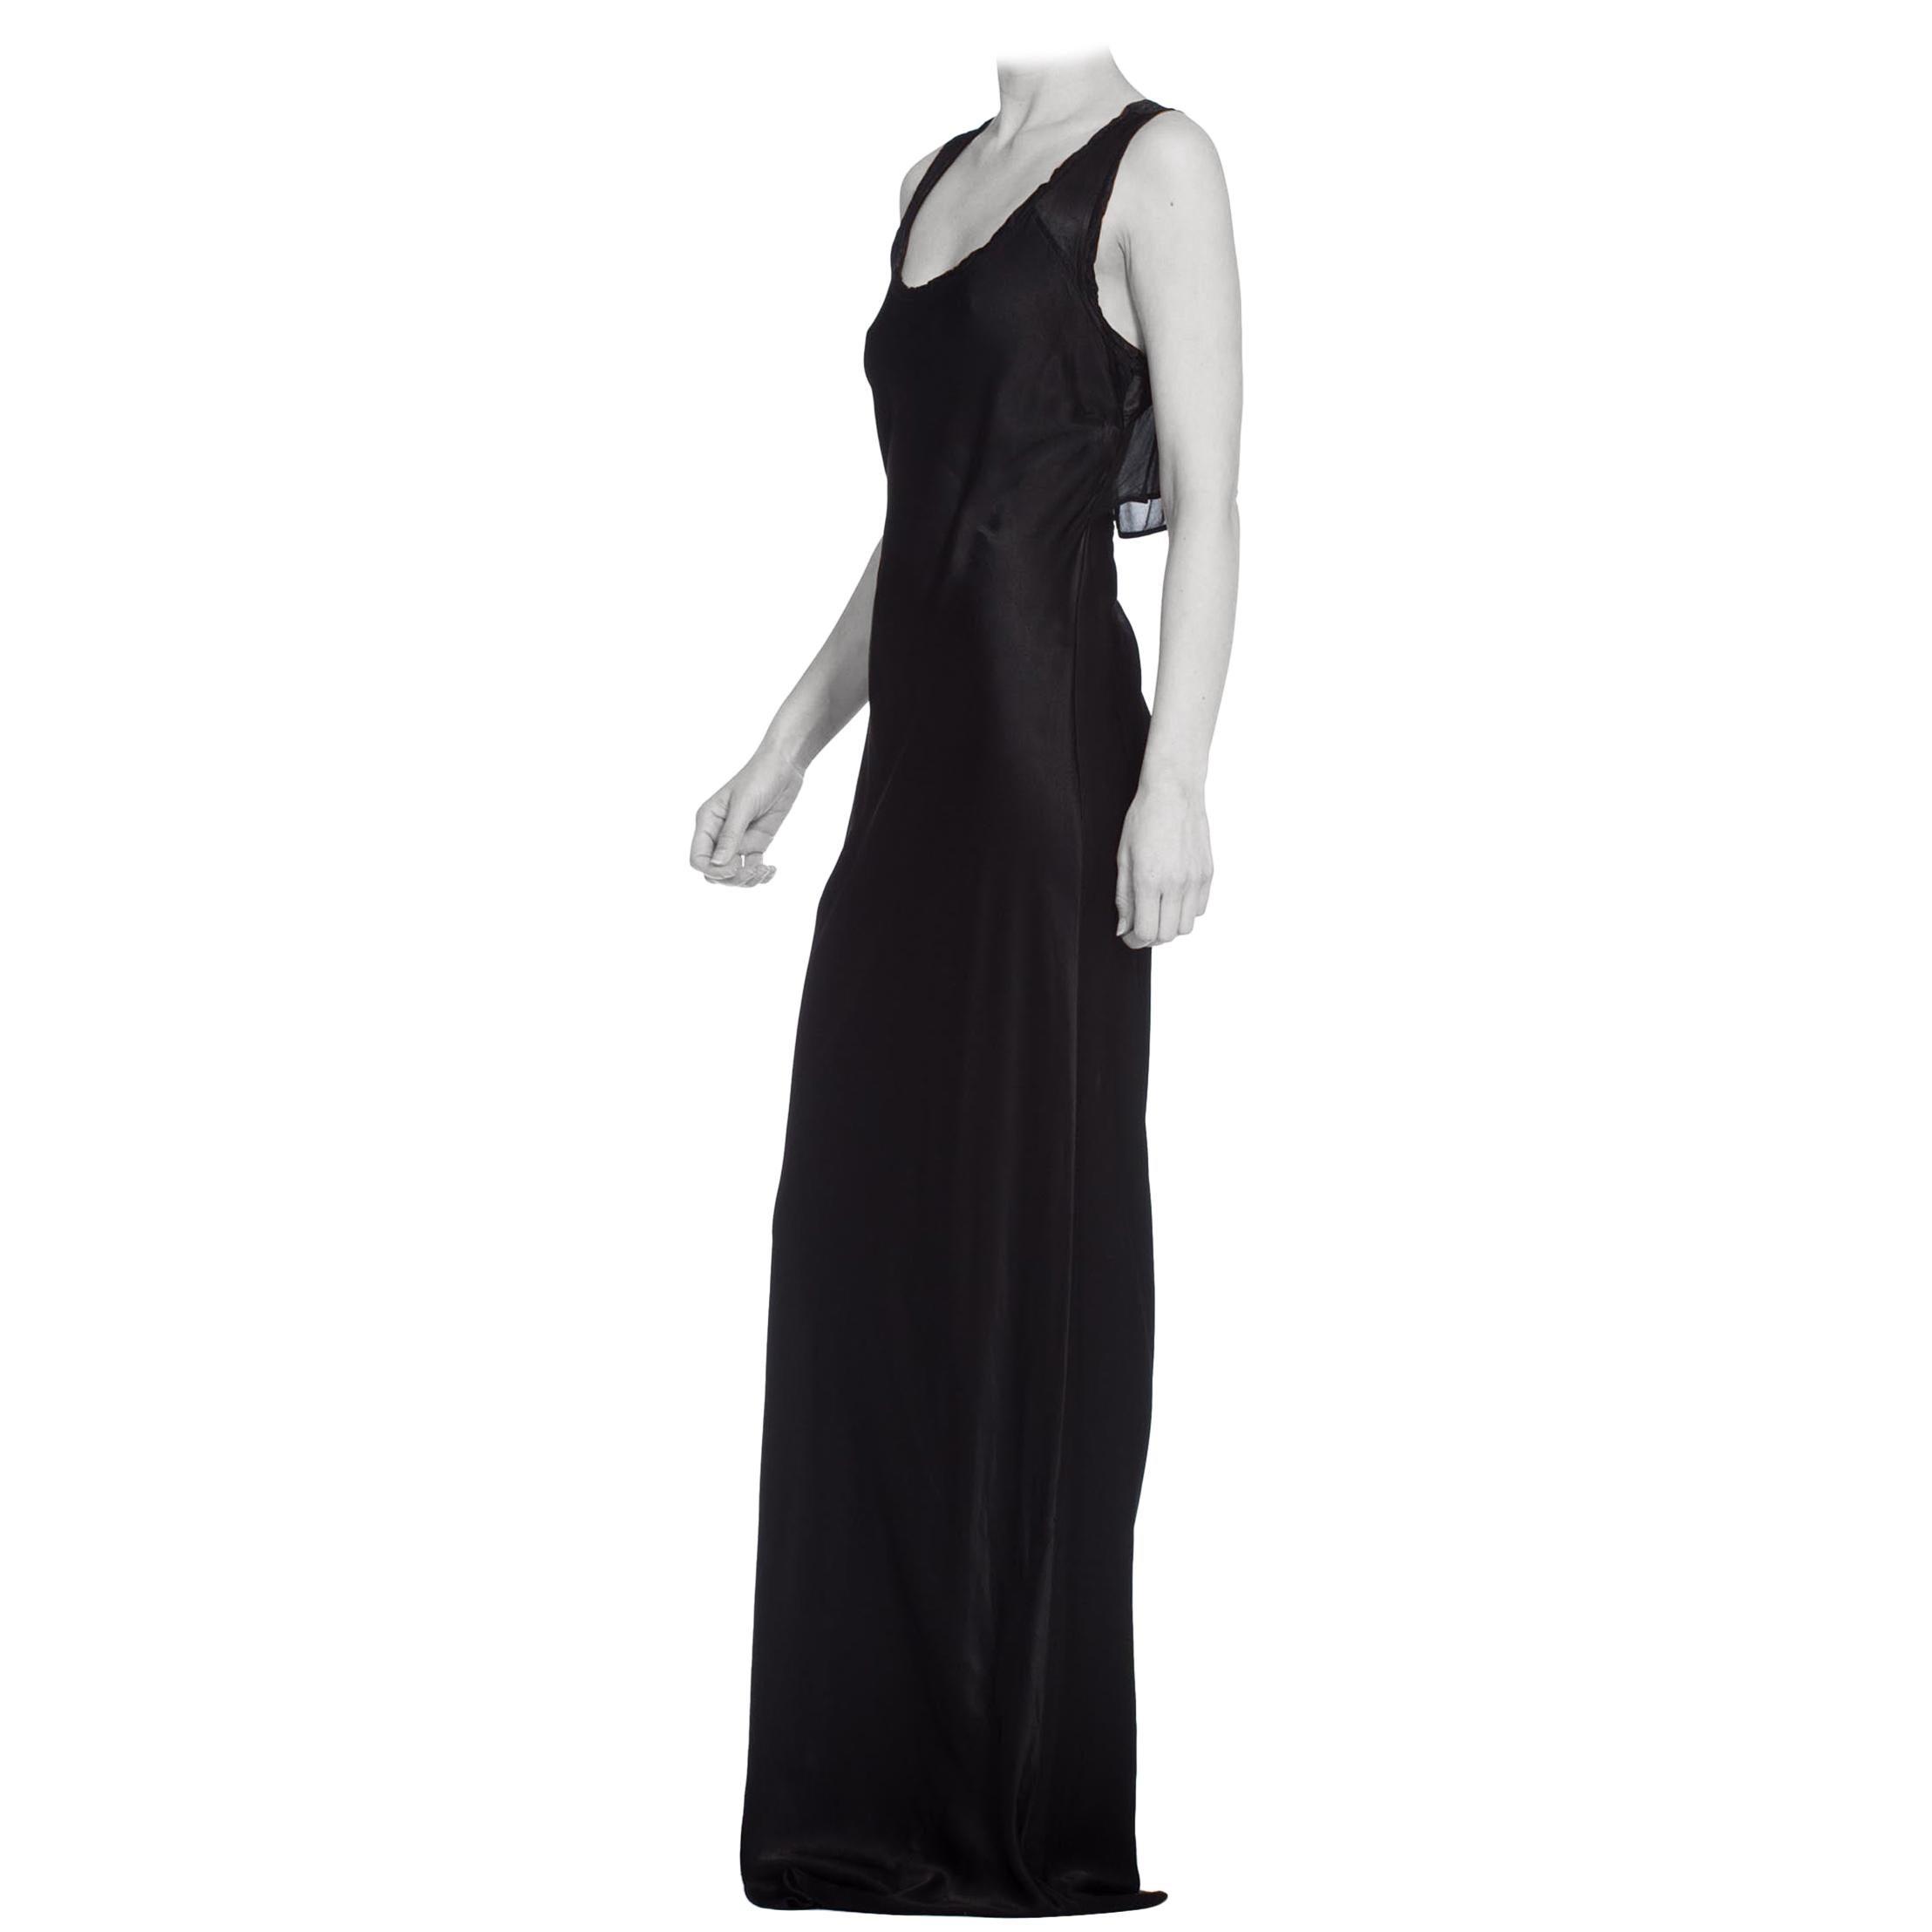 3179f8d7c736 Bias Cut Dresses - 468 For Sale on 1stdibs